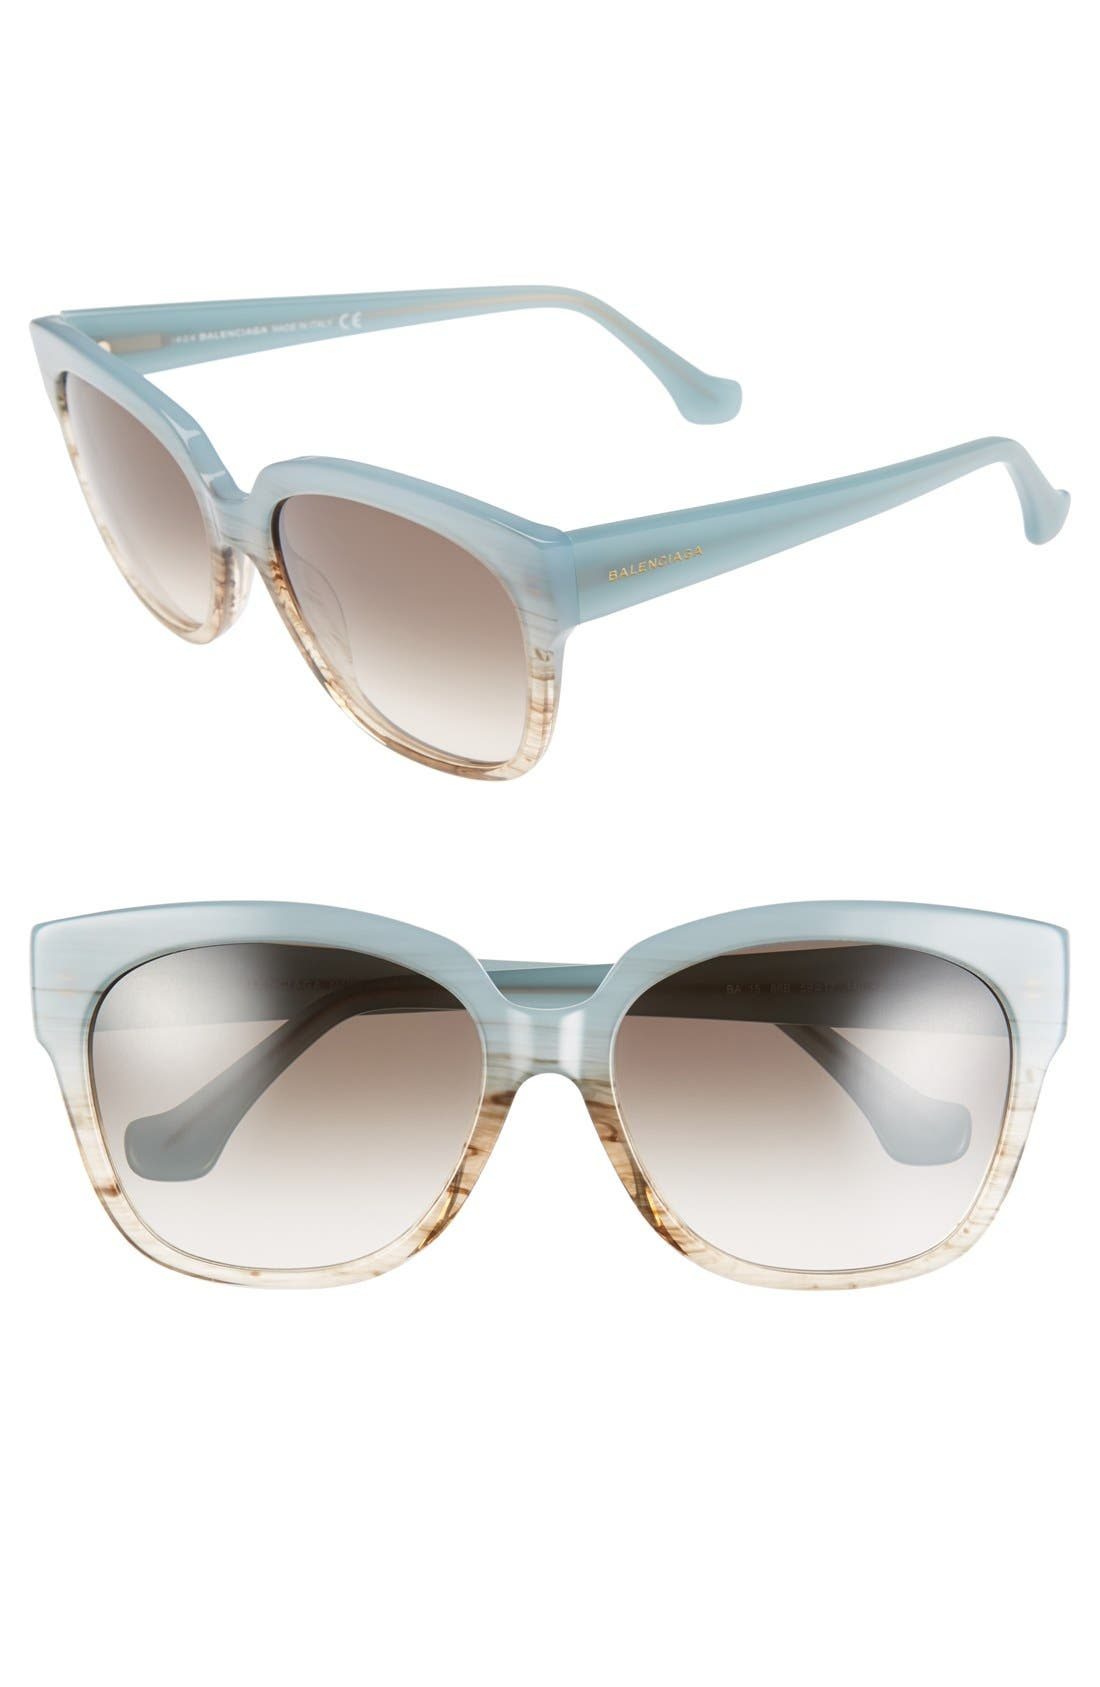 BALENCIAGA Paris 59mm BA0015 Sunglasses